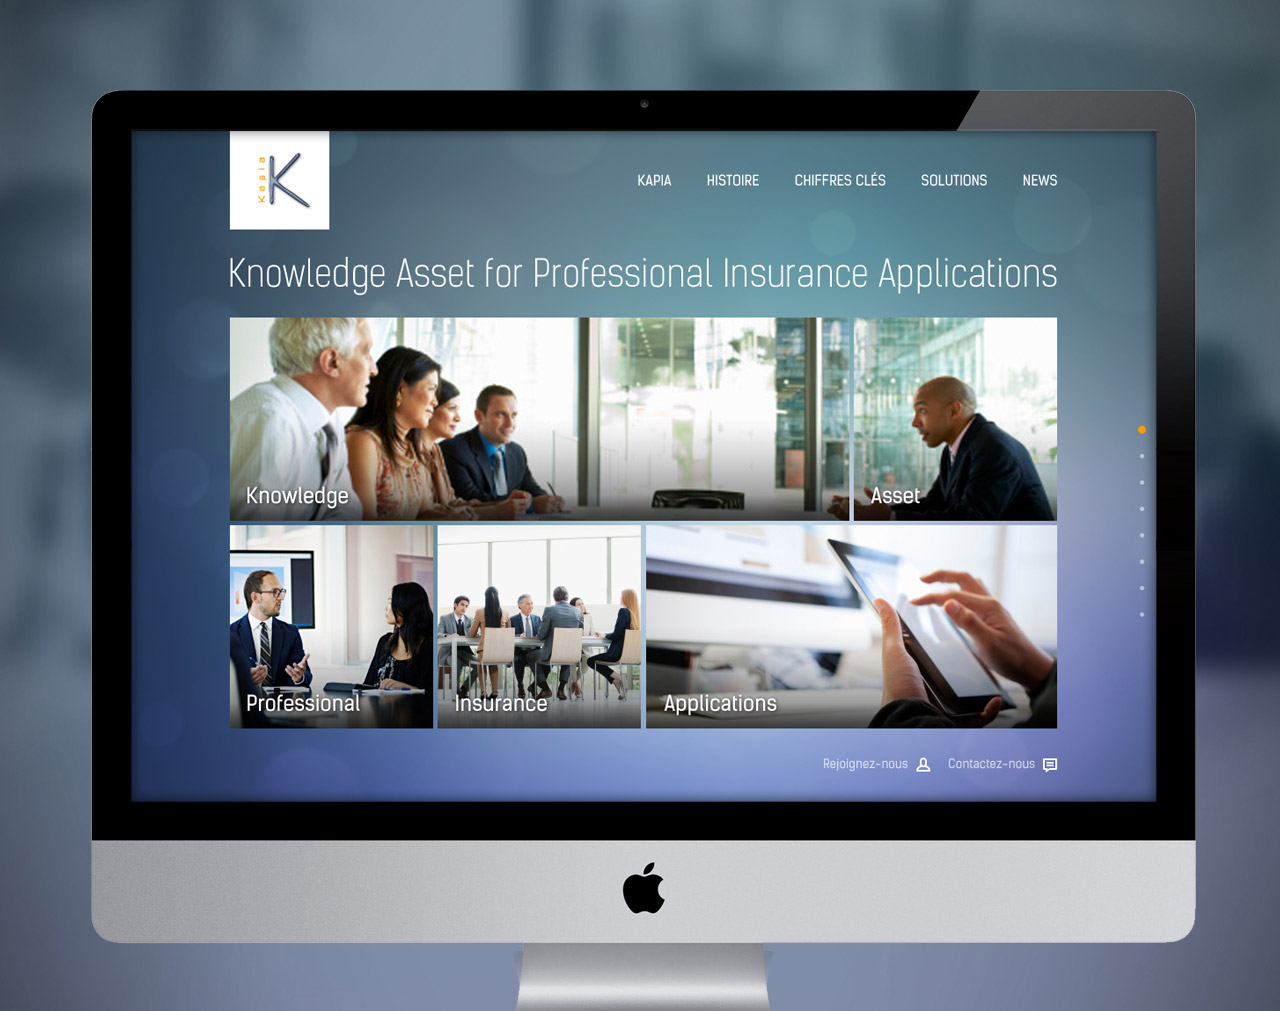 kapia-solutions-accueil-site-internet-responsive-design-creation-communication-caconcept-alexis-cretin-graphiste